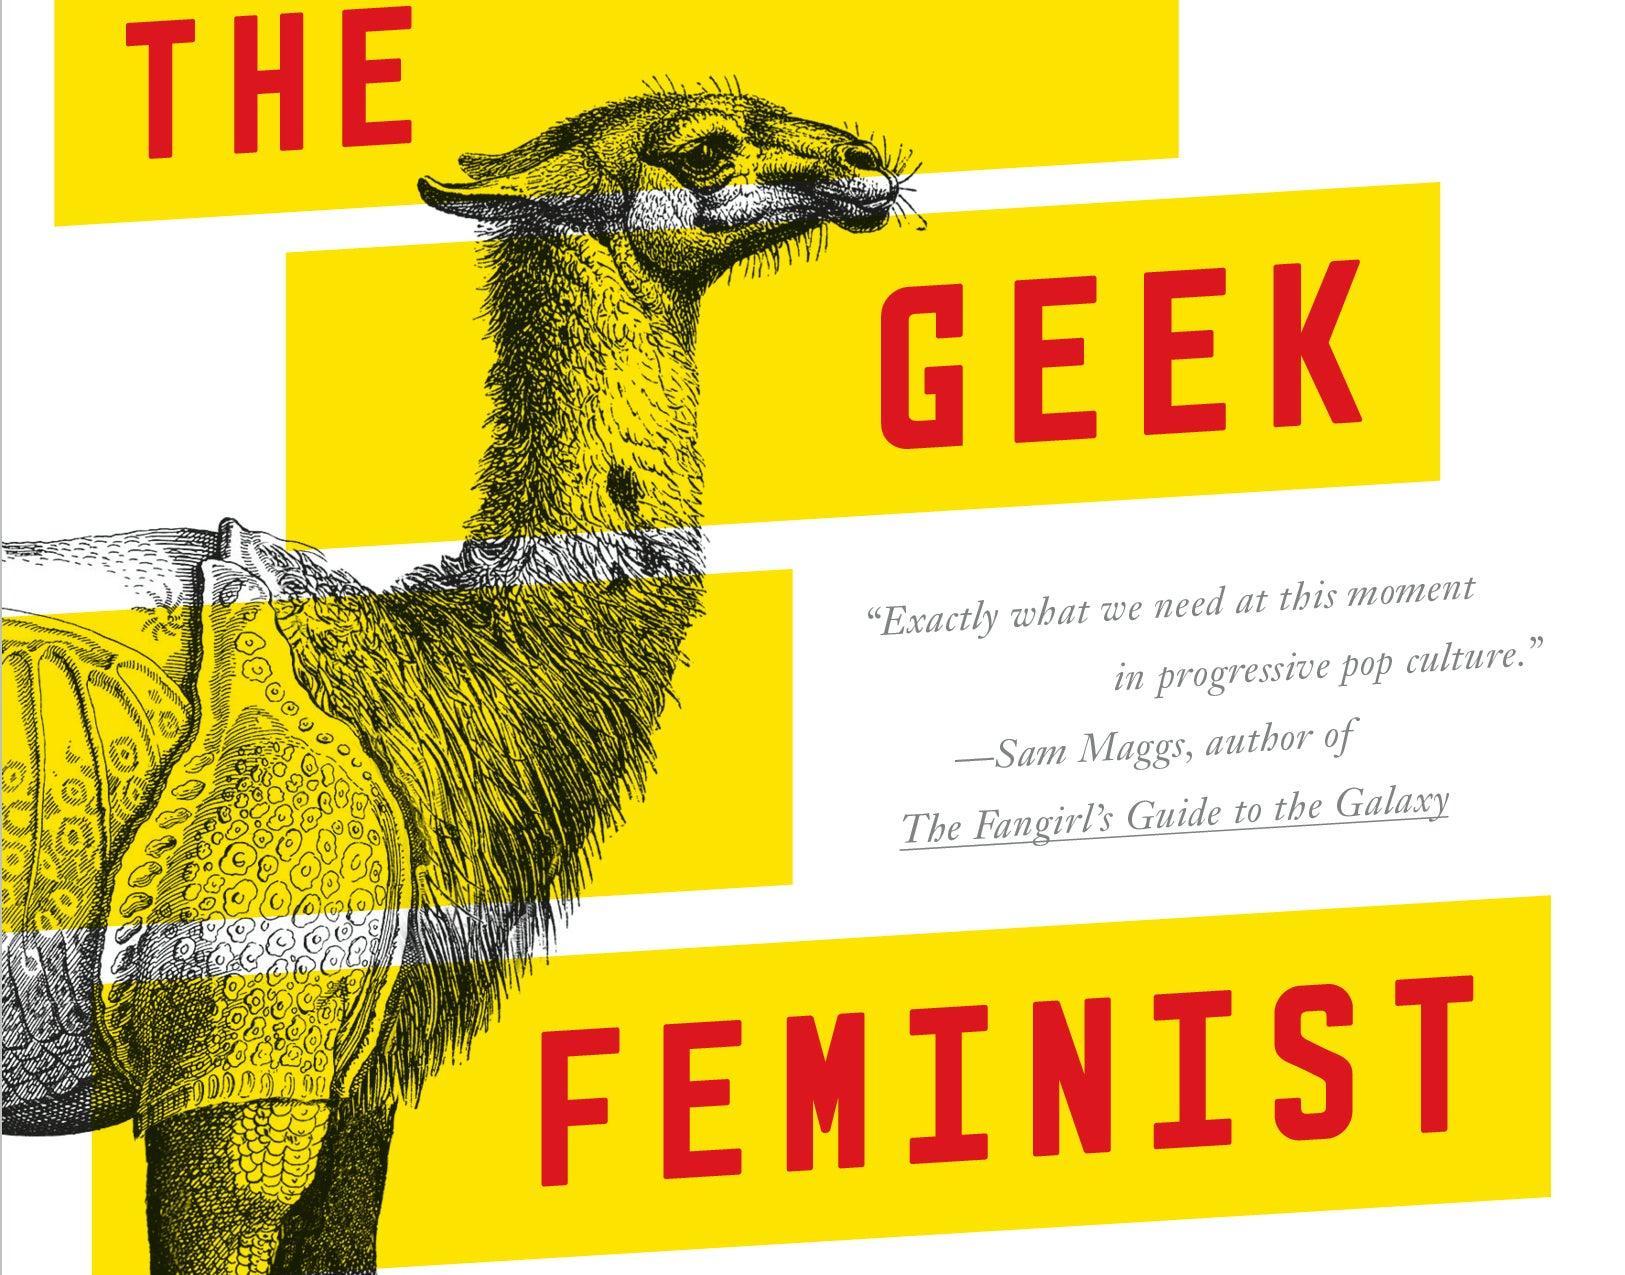 book-review feminism io9 kameron-hurley nonfiction